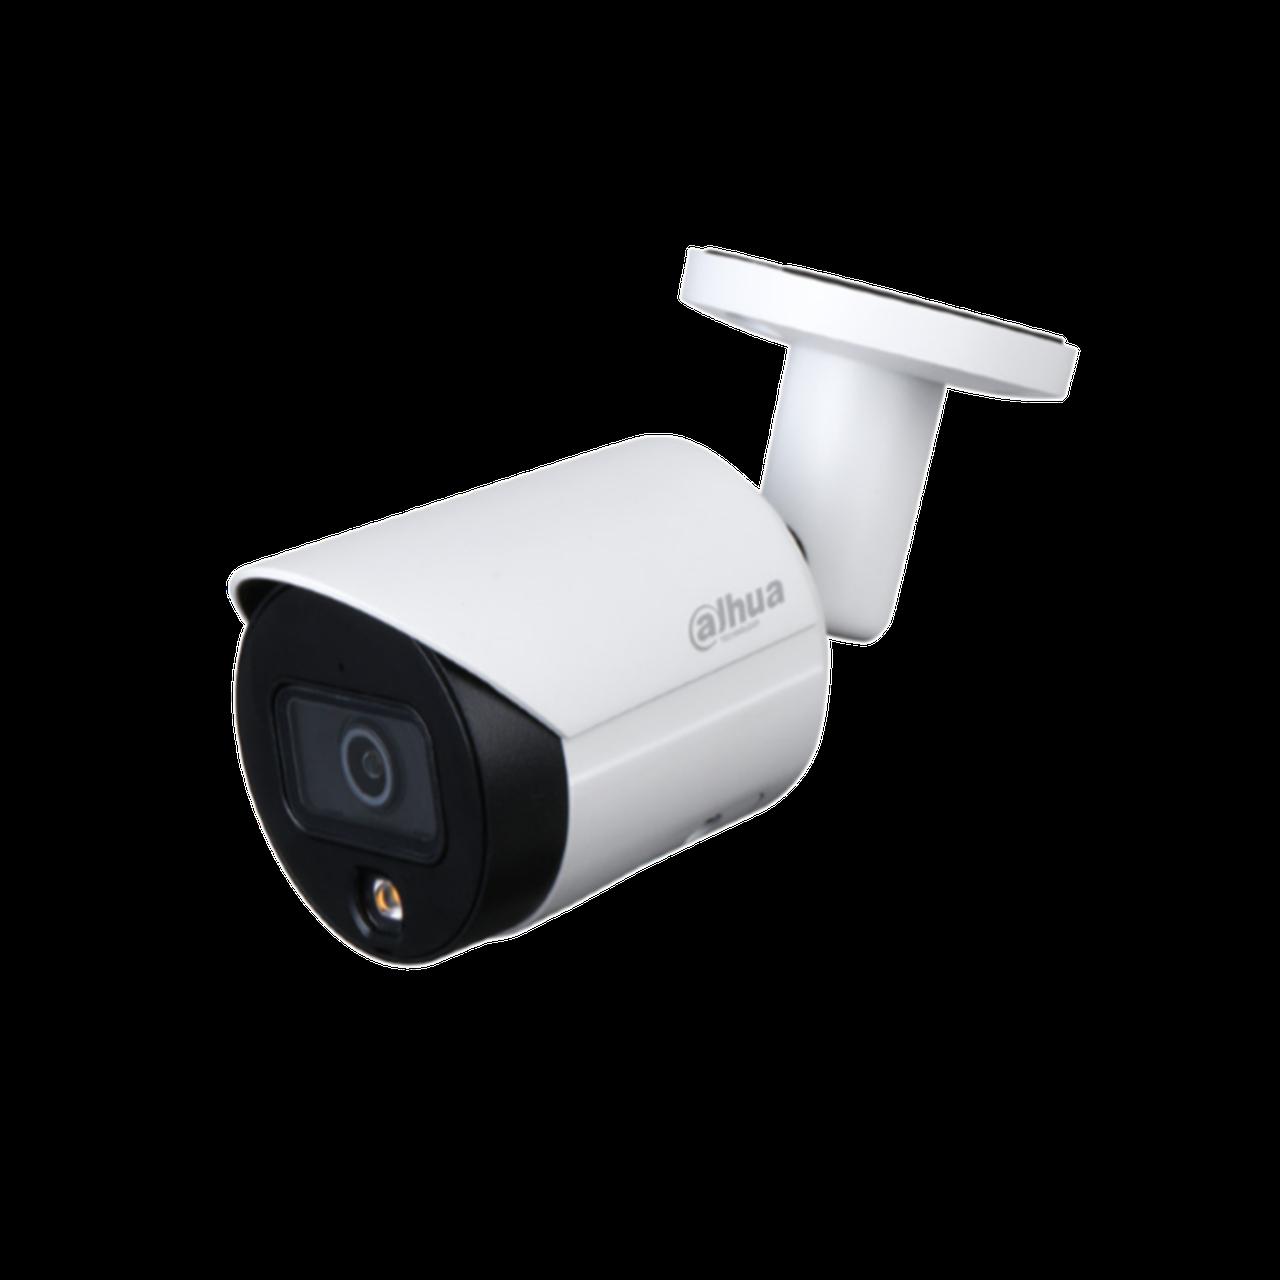 DH-IPC-HFW2439SP-SA-LED-S2 4Мп FullColor IP камера Dahua